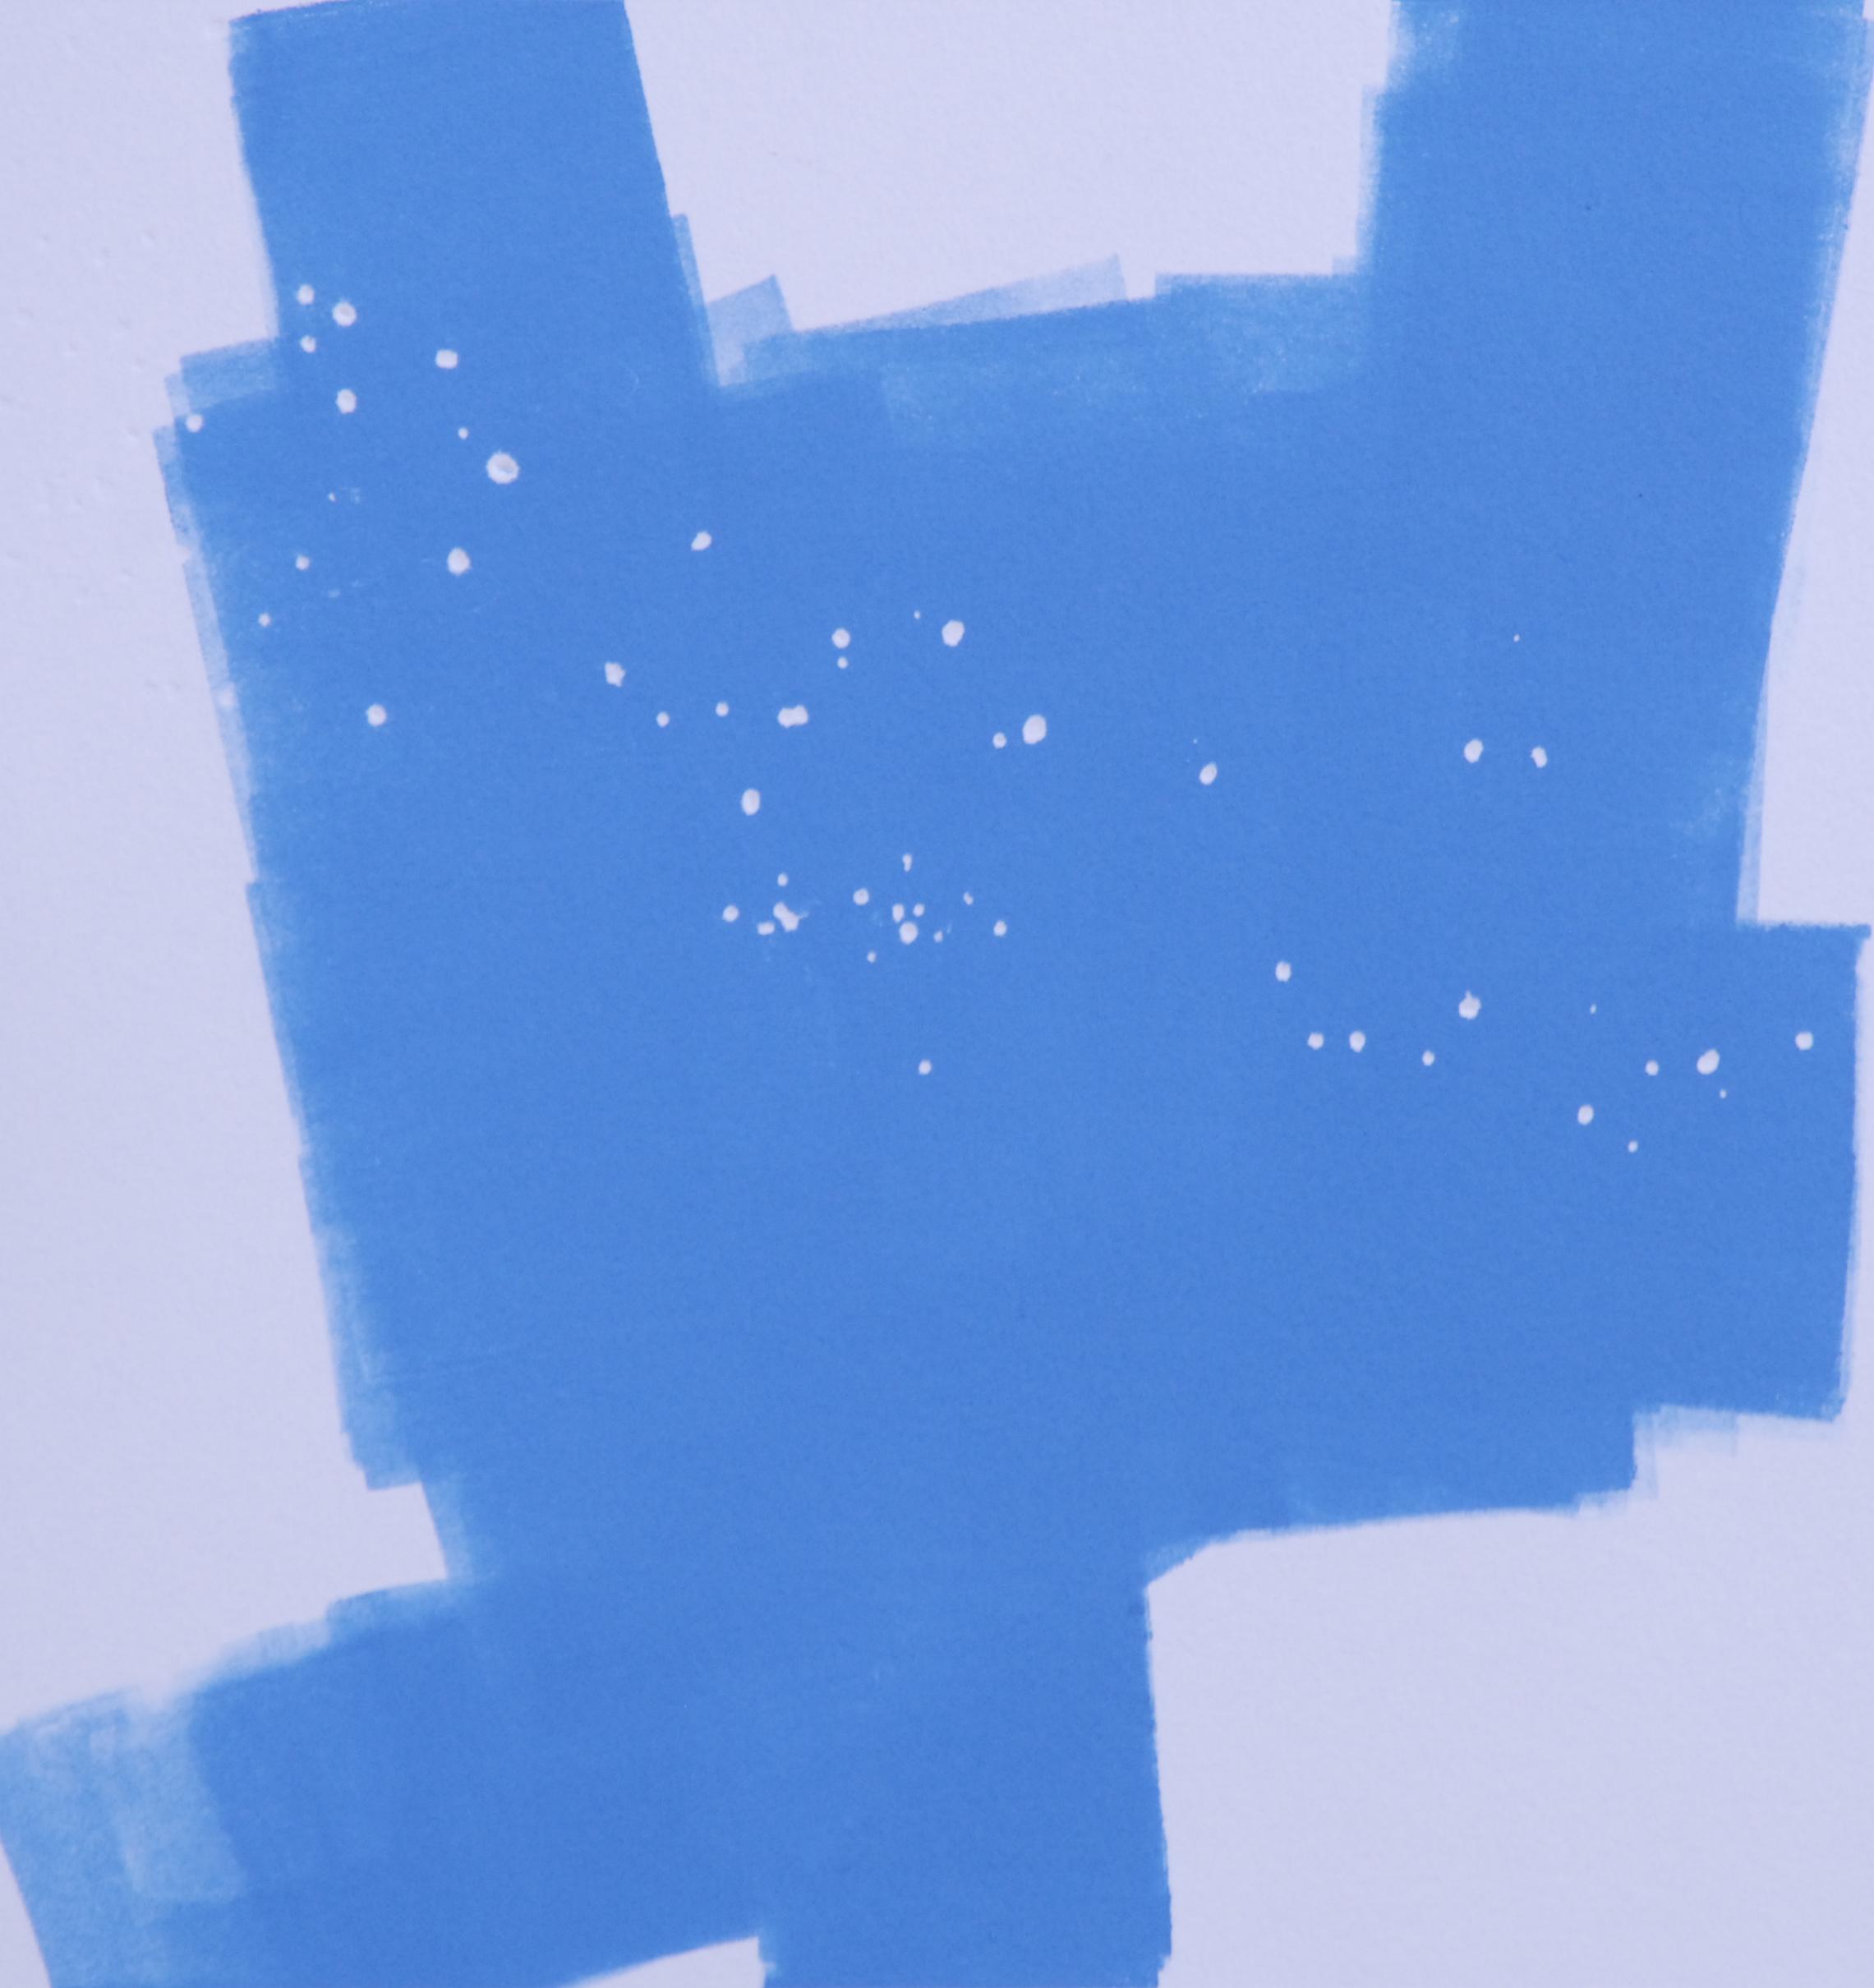 "Sodium Deviation 15, 2016  monoprint  10"" x 10"" image on 11"" x 14"" paper"